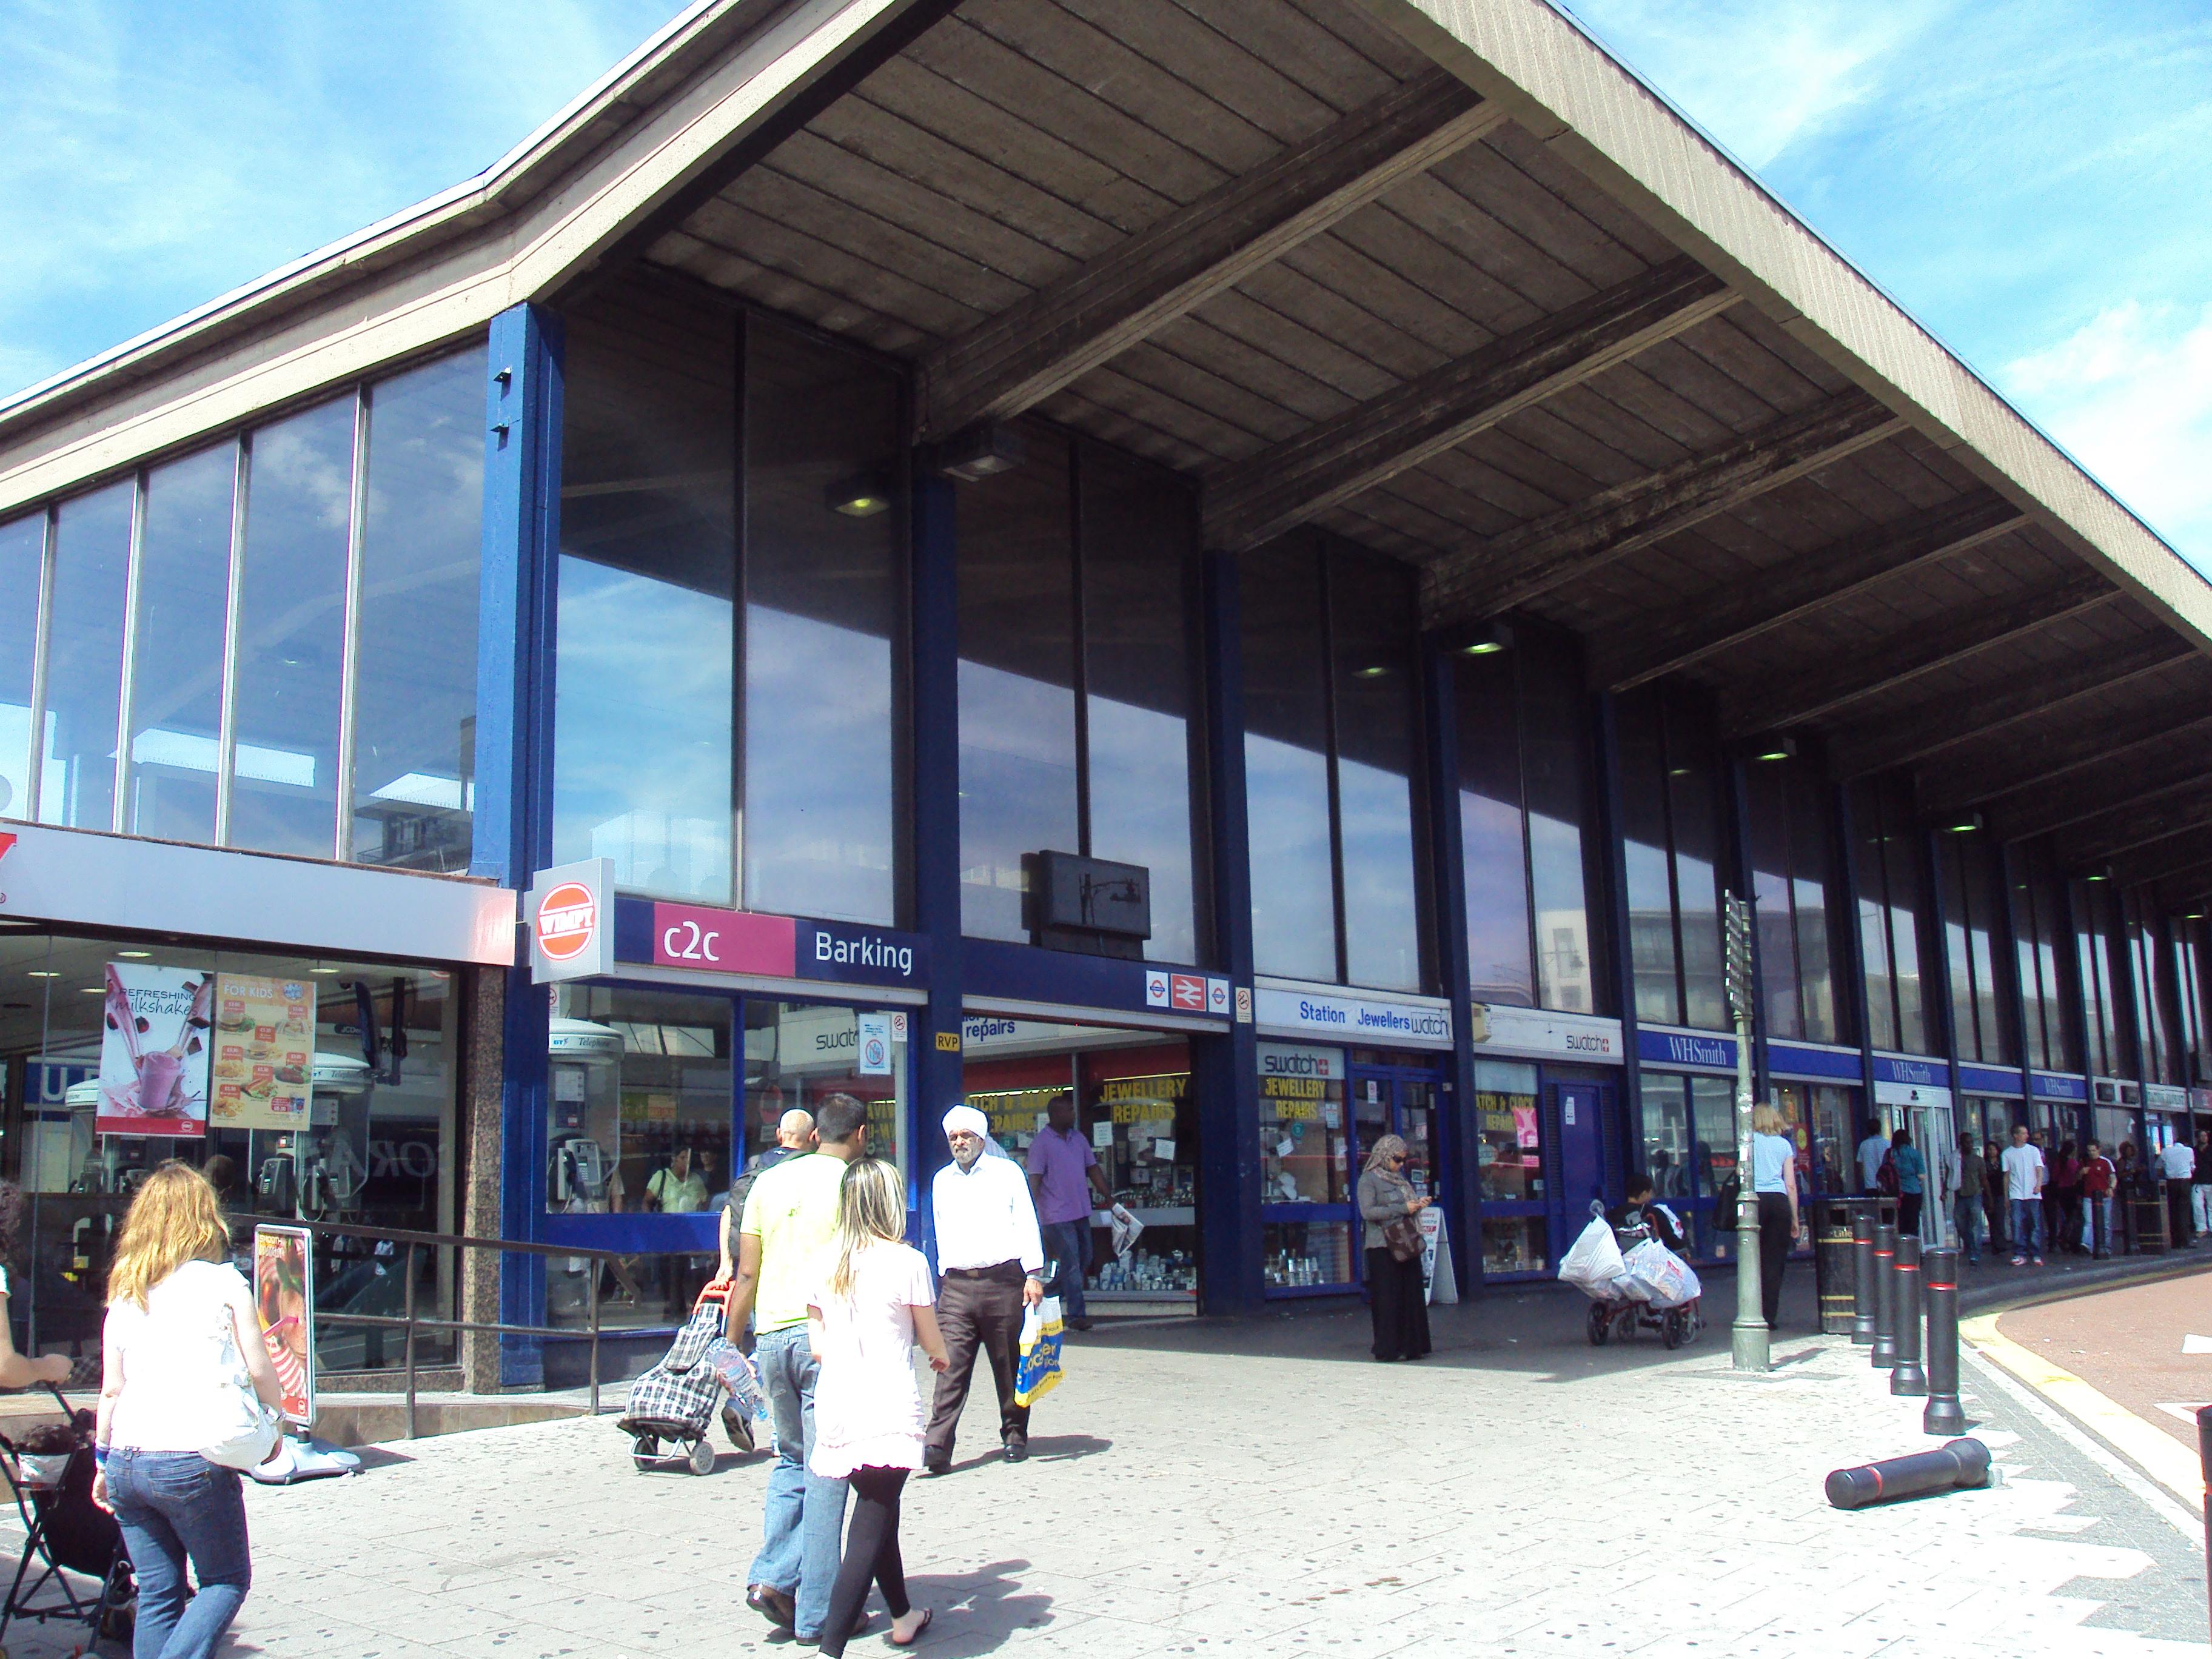 Barking railway station - (c) Rept0n1x